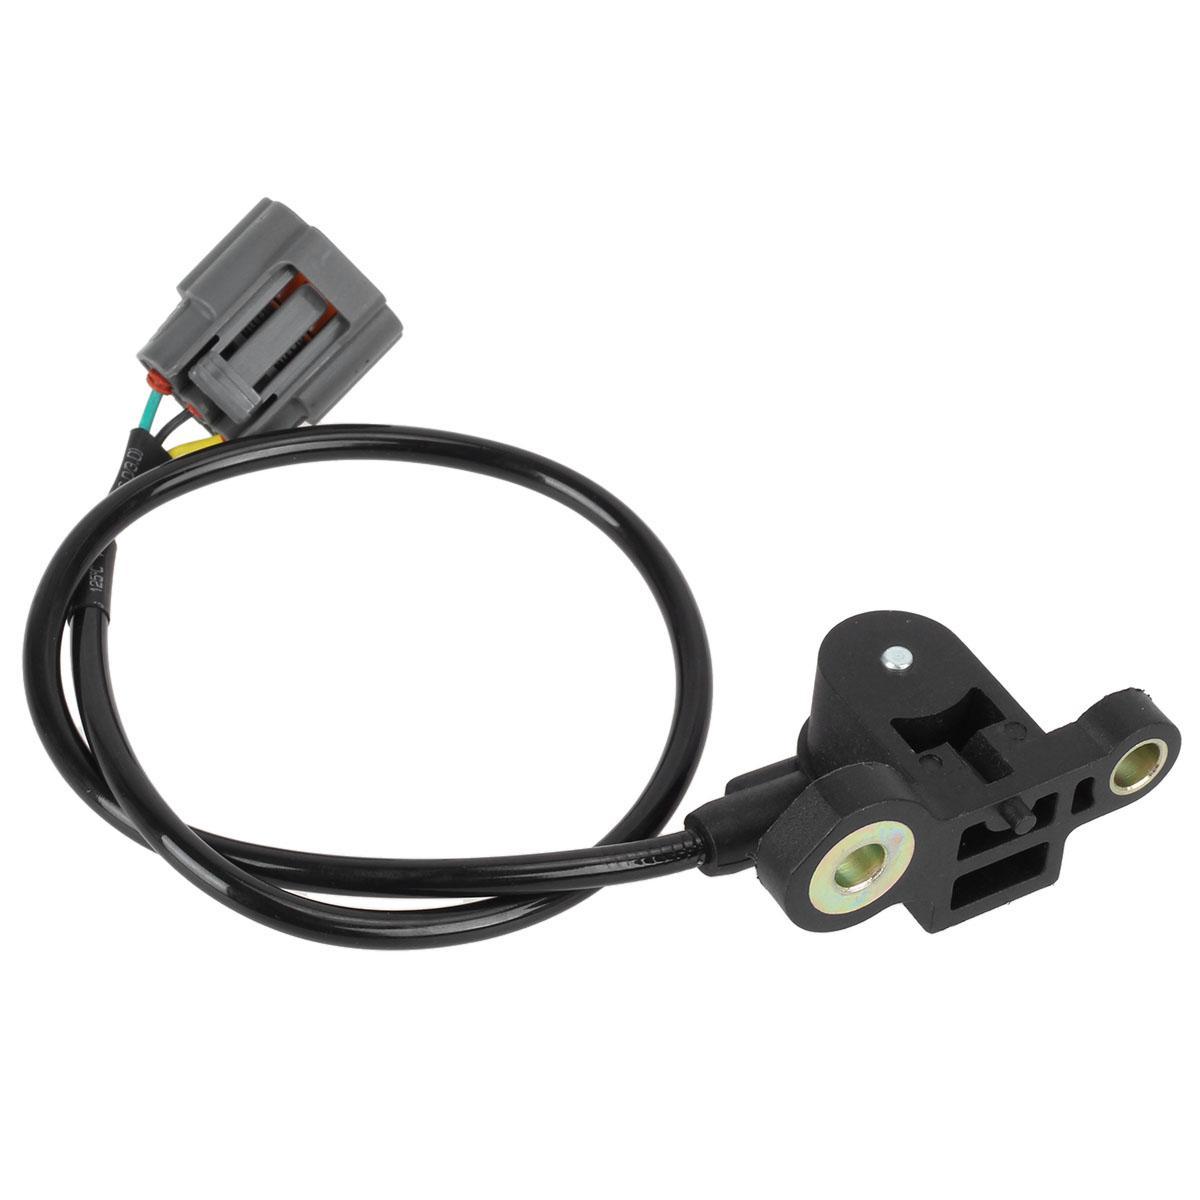 Fsd718221b Crankshaft Position Sensor For 1999 2002 Mazda 626 Lx White Protege 20l